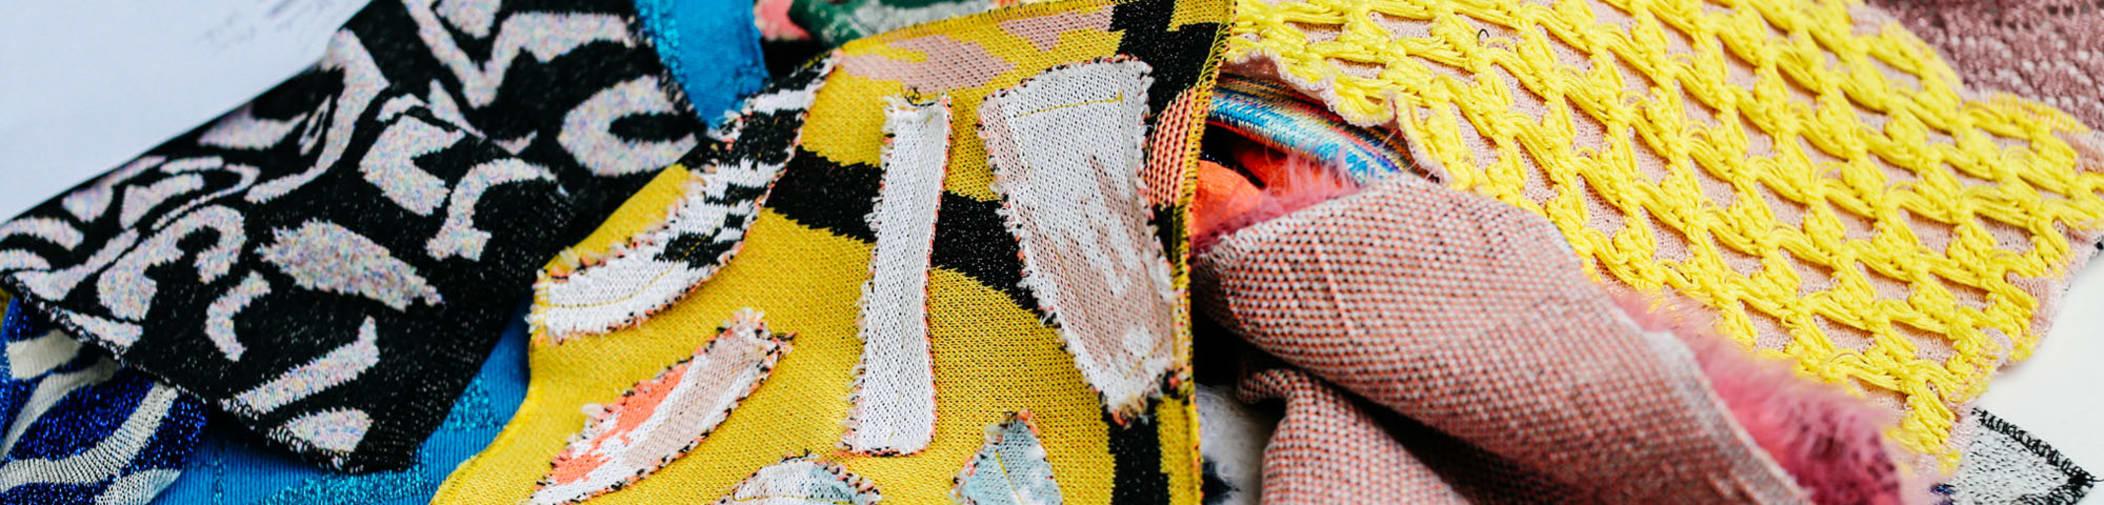 Textiles and knitwear designs by Lynn Yaung, BA (Hons) Fashion- Fashion Design with Knitwear student, Central Saint Martins